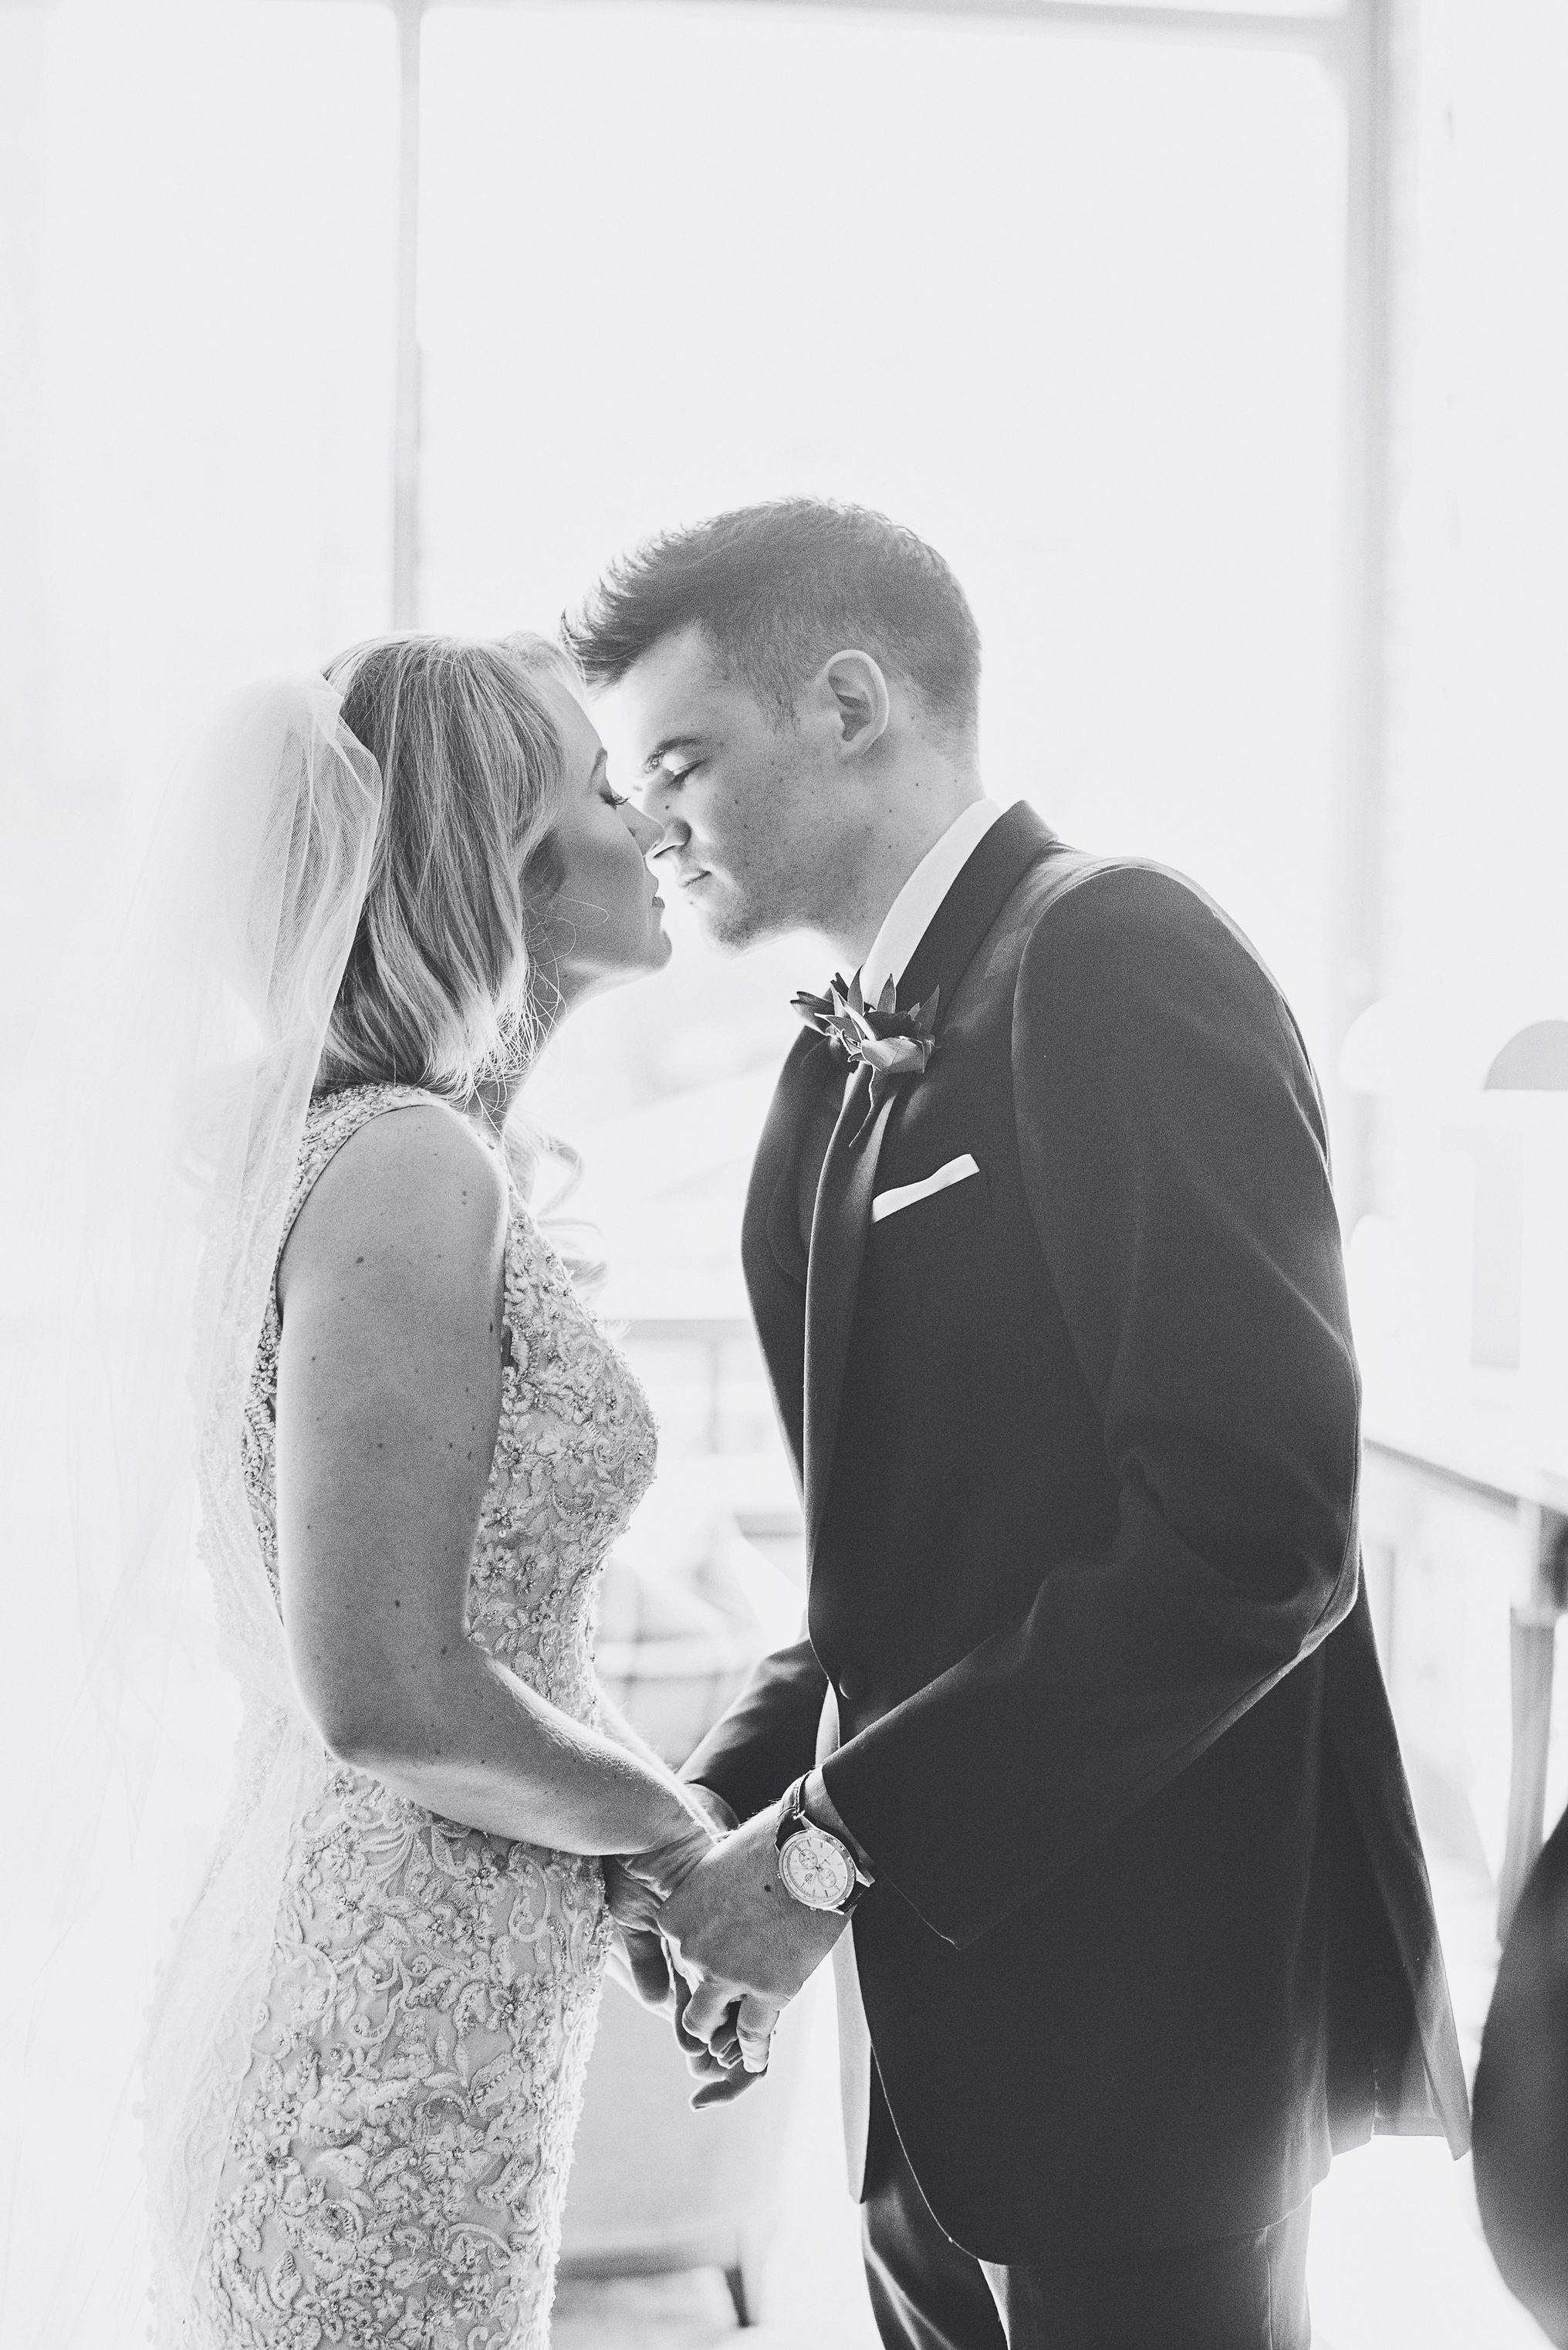 best_wedding_photography_2017_by_lucas_botz_photography_226.jpg